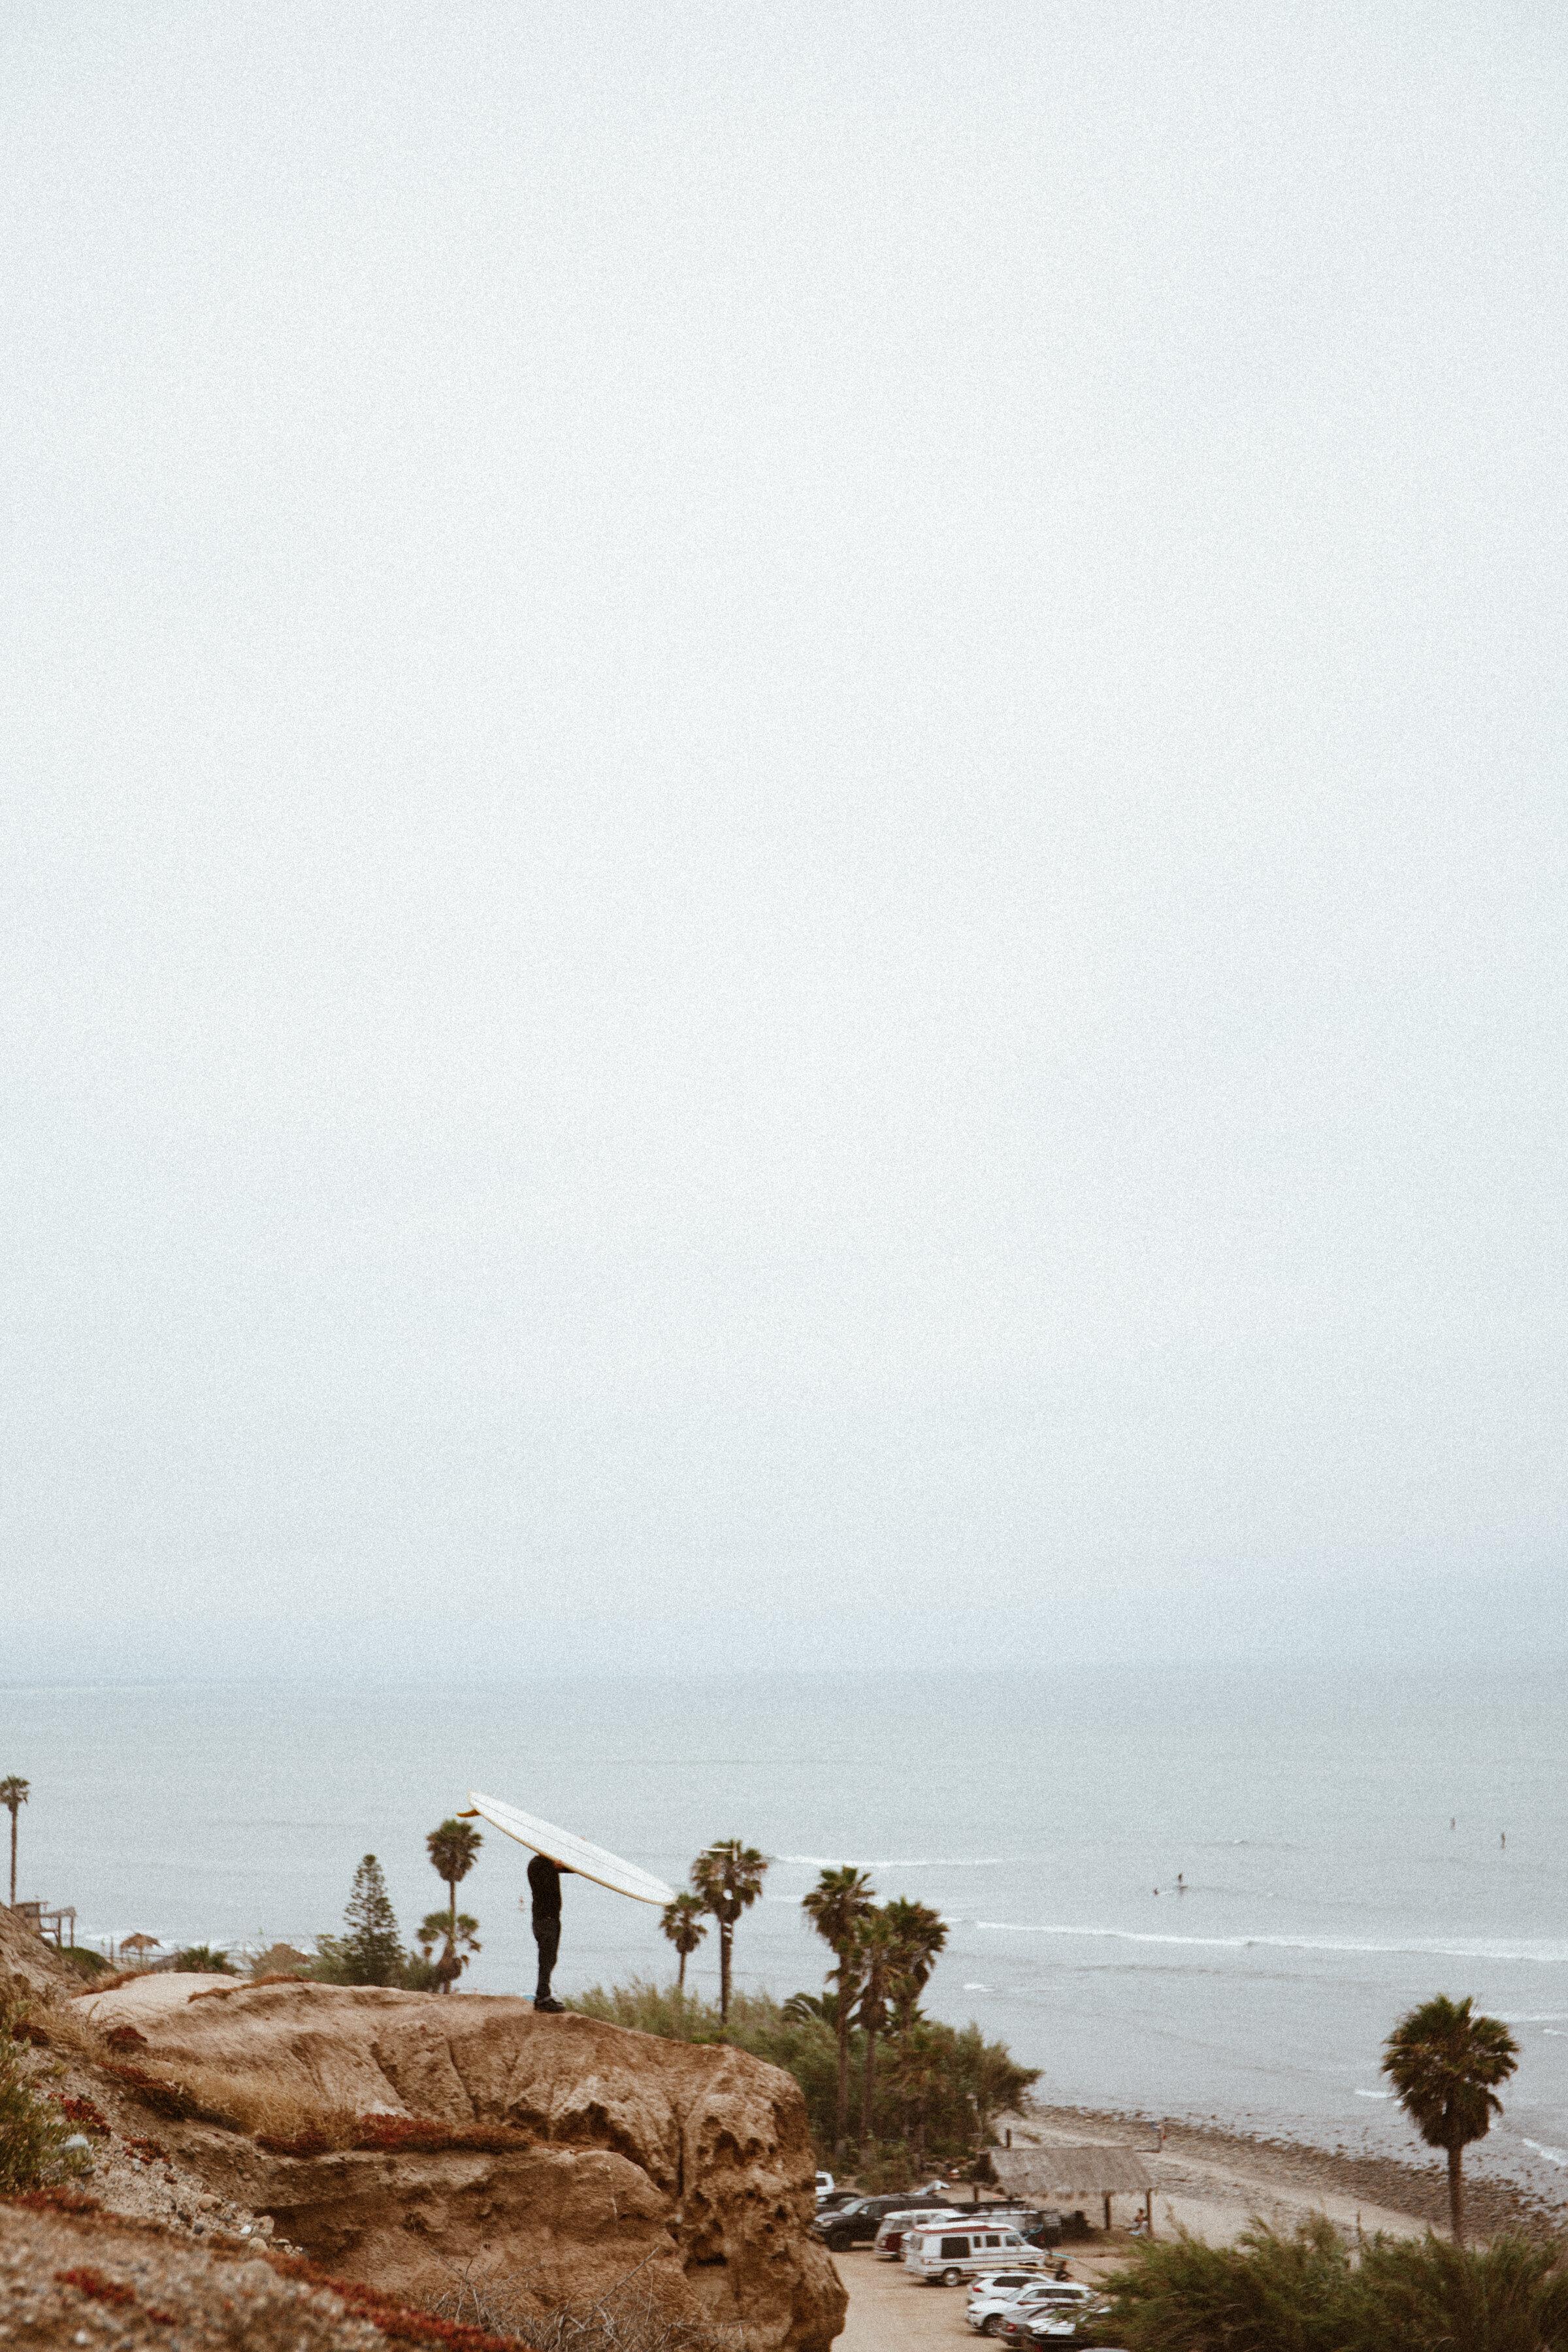 california-6852.jpg